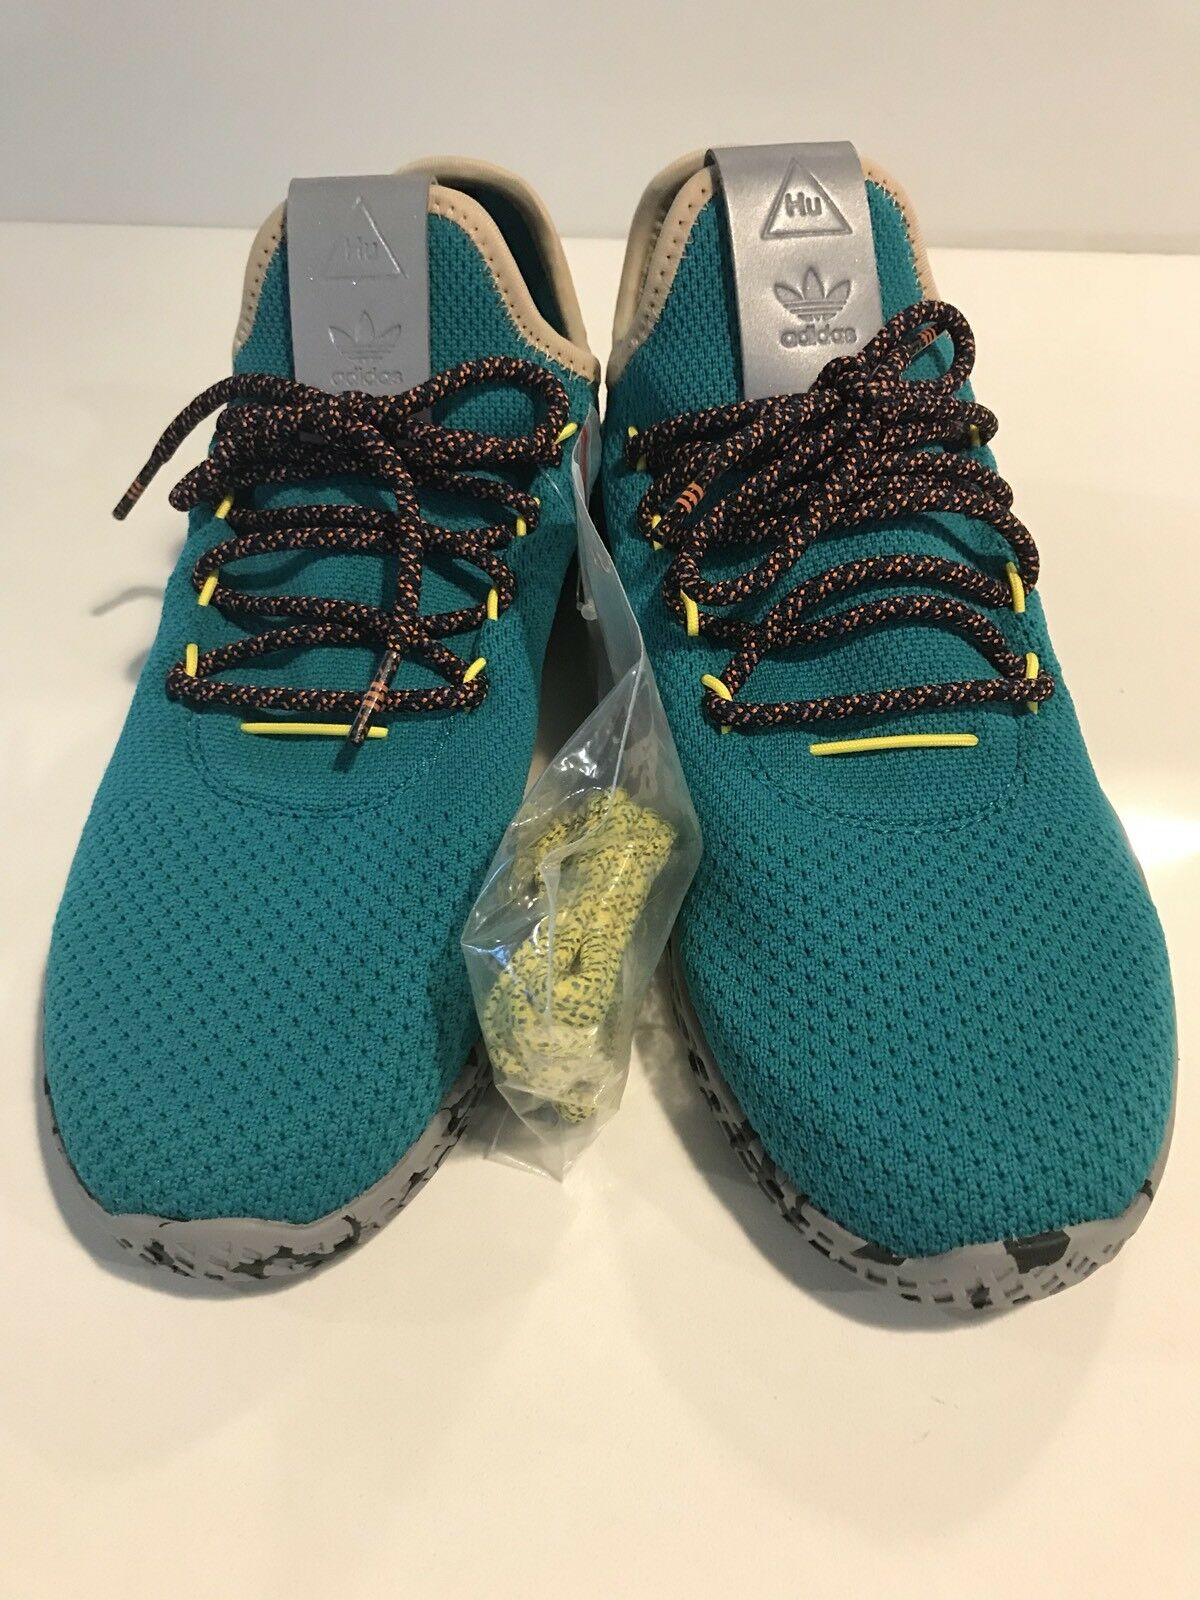 Adidas Pharrell Williams  HU HU HU Tennis Shoes 8b33cd